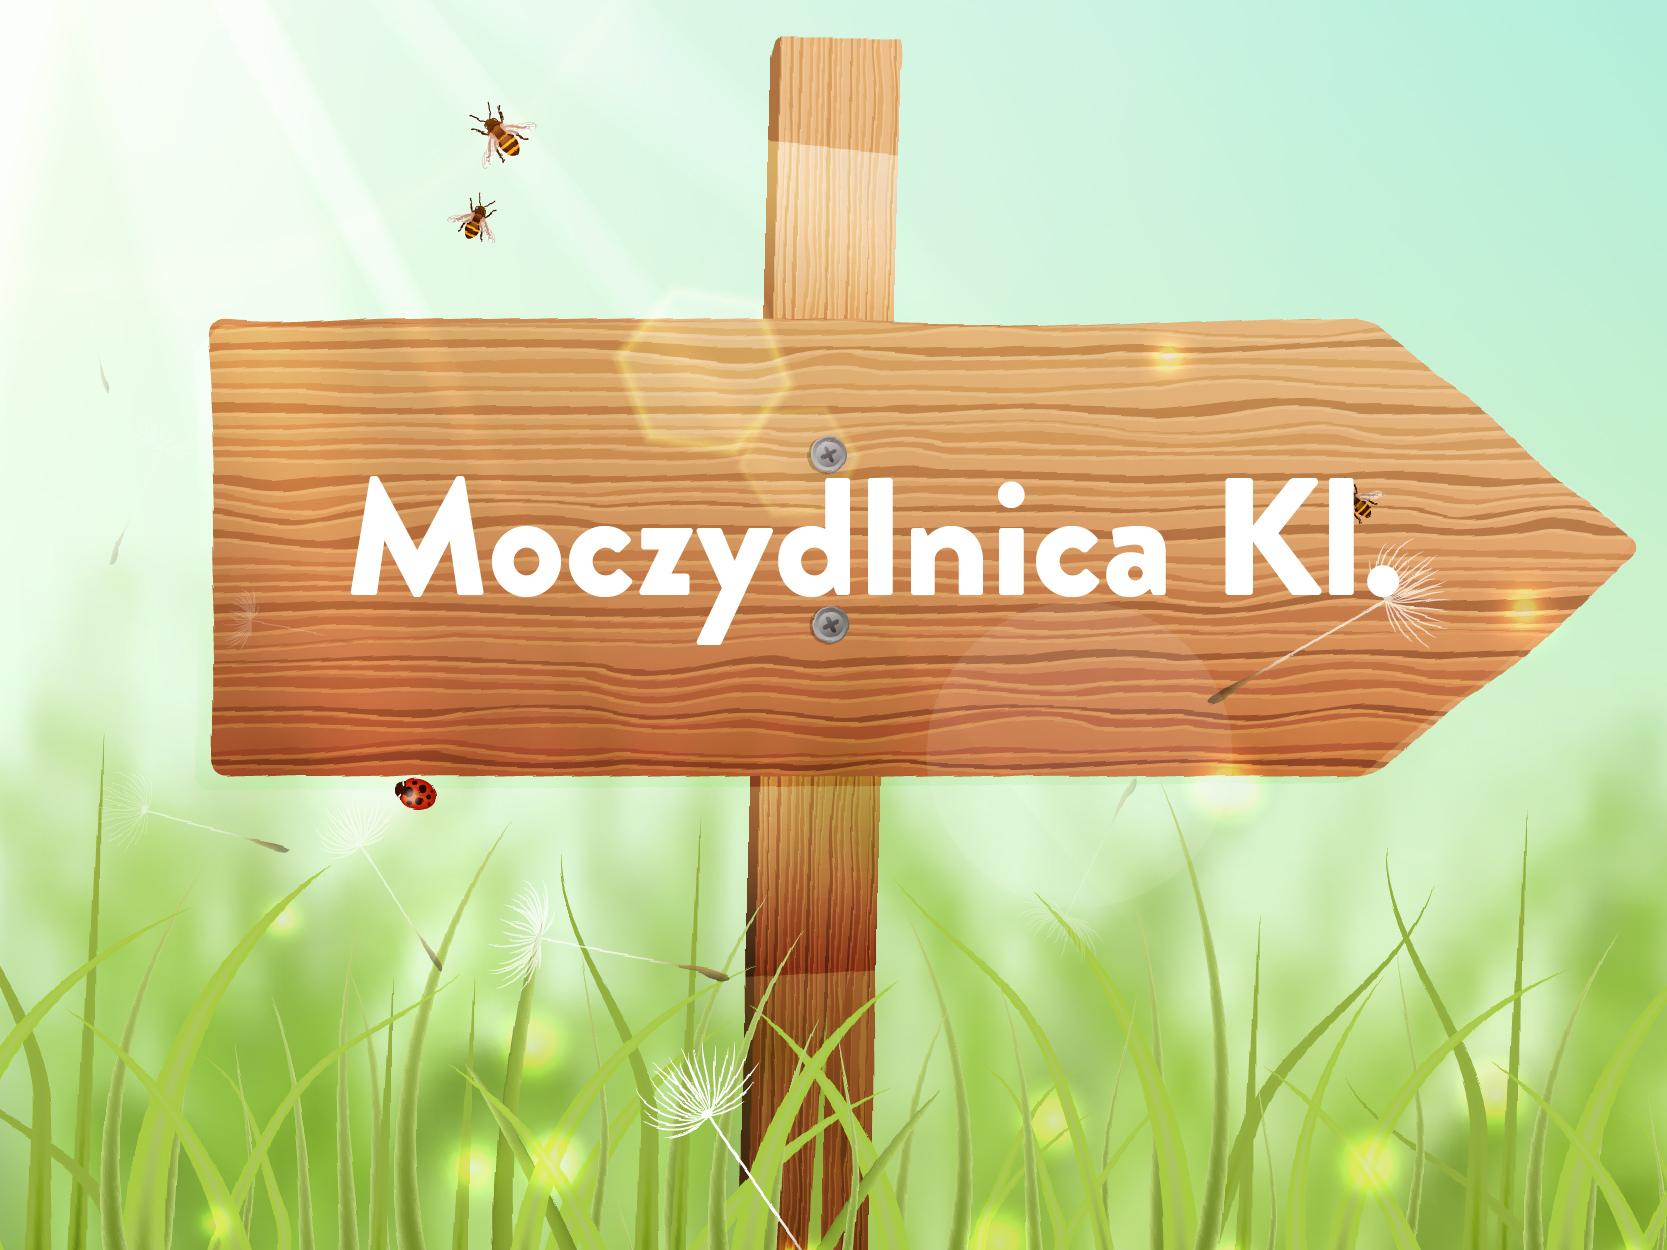 sołectwo Moczydlnica KL.